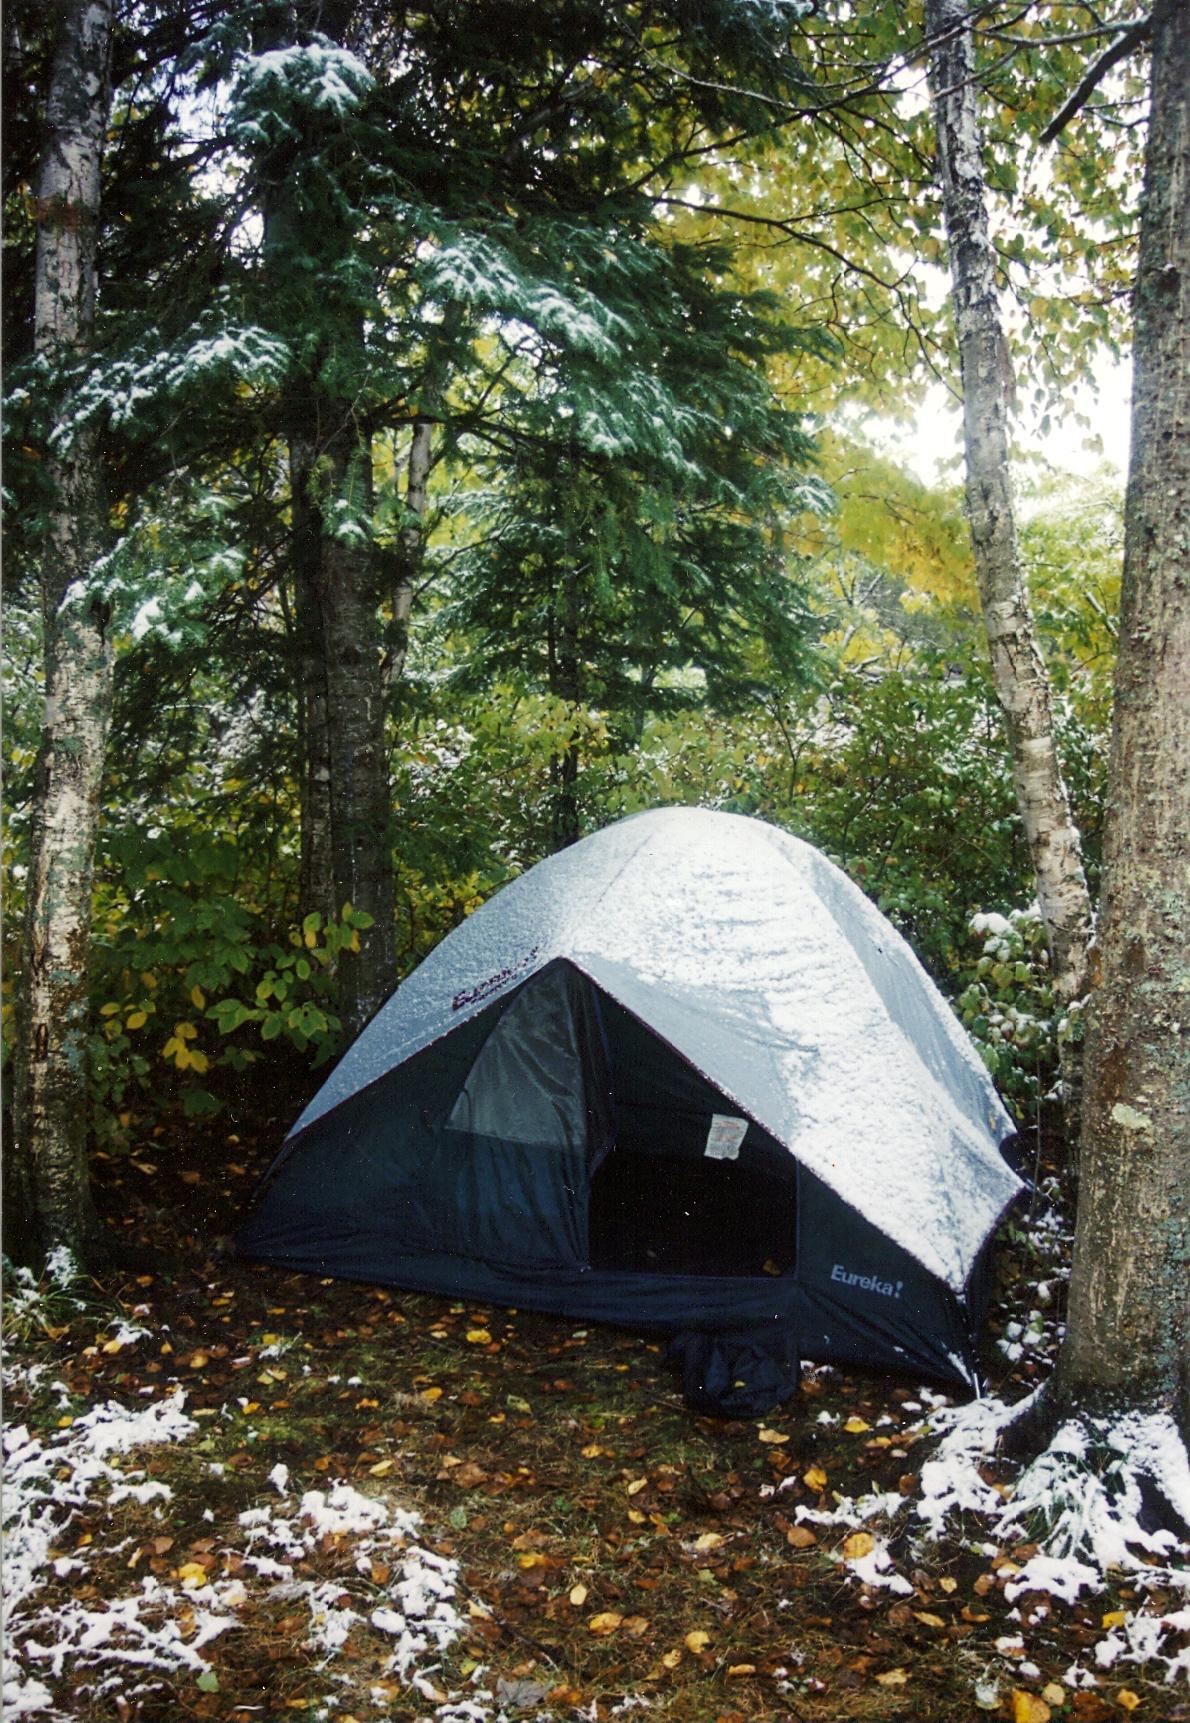 Bwca Gander Mountain Tents Boundary Waters Gear Forum & Gander Mountain Aurora 5 Tent - Best Mountain 2017